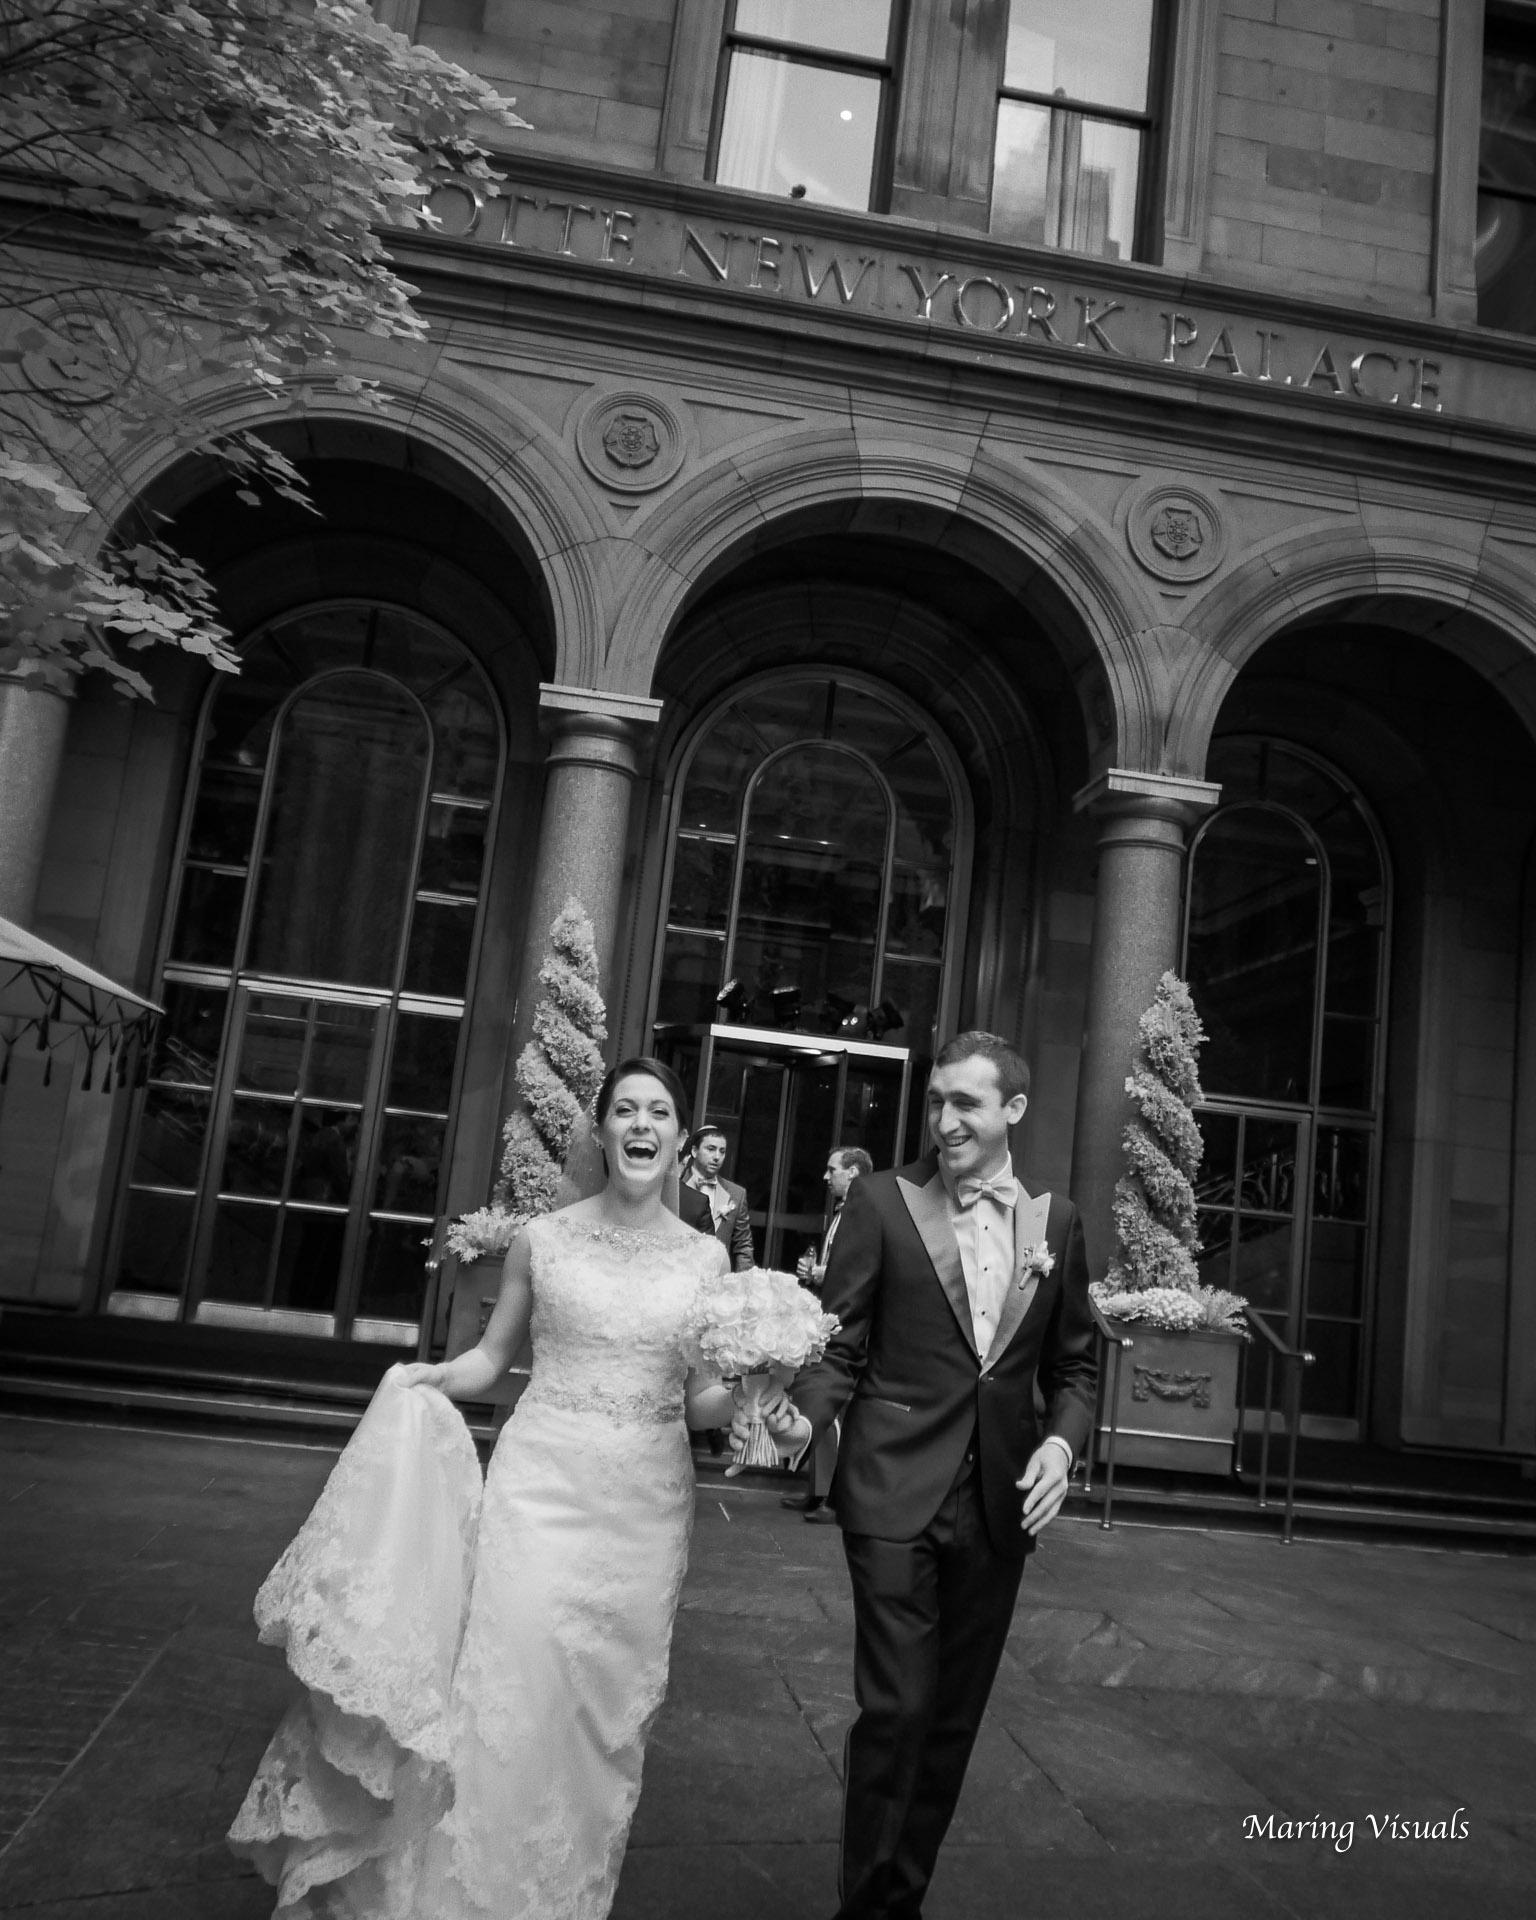 Lotte New York Palace Wedding 00189.jpg